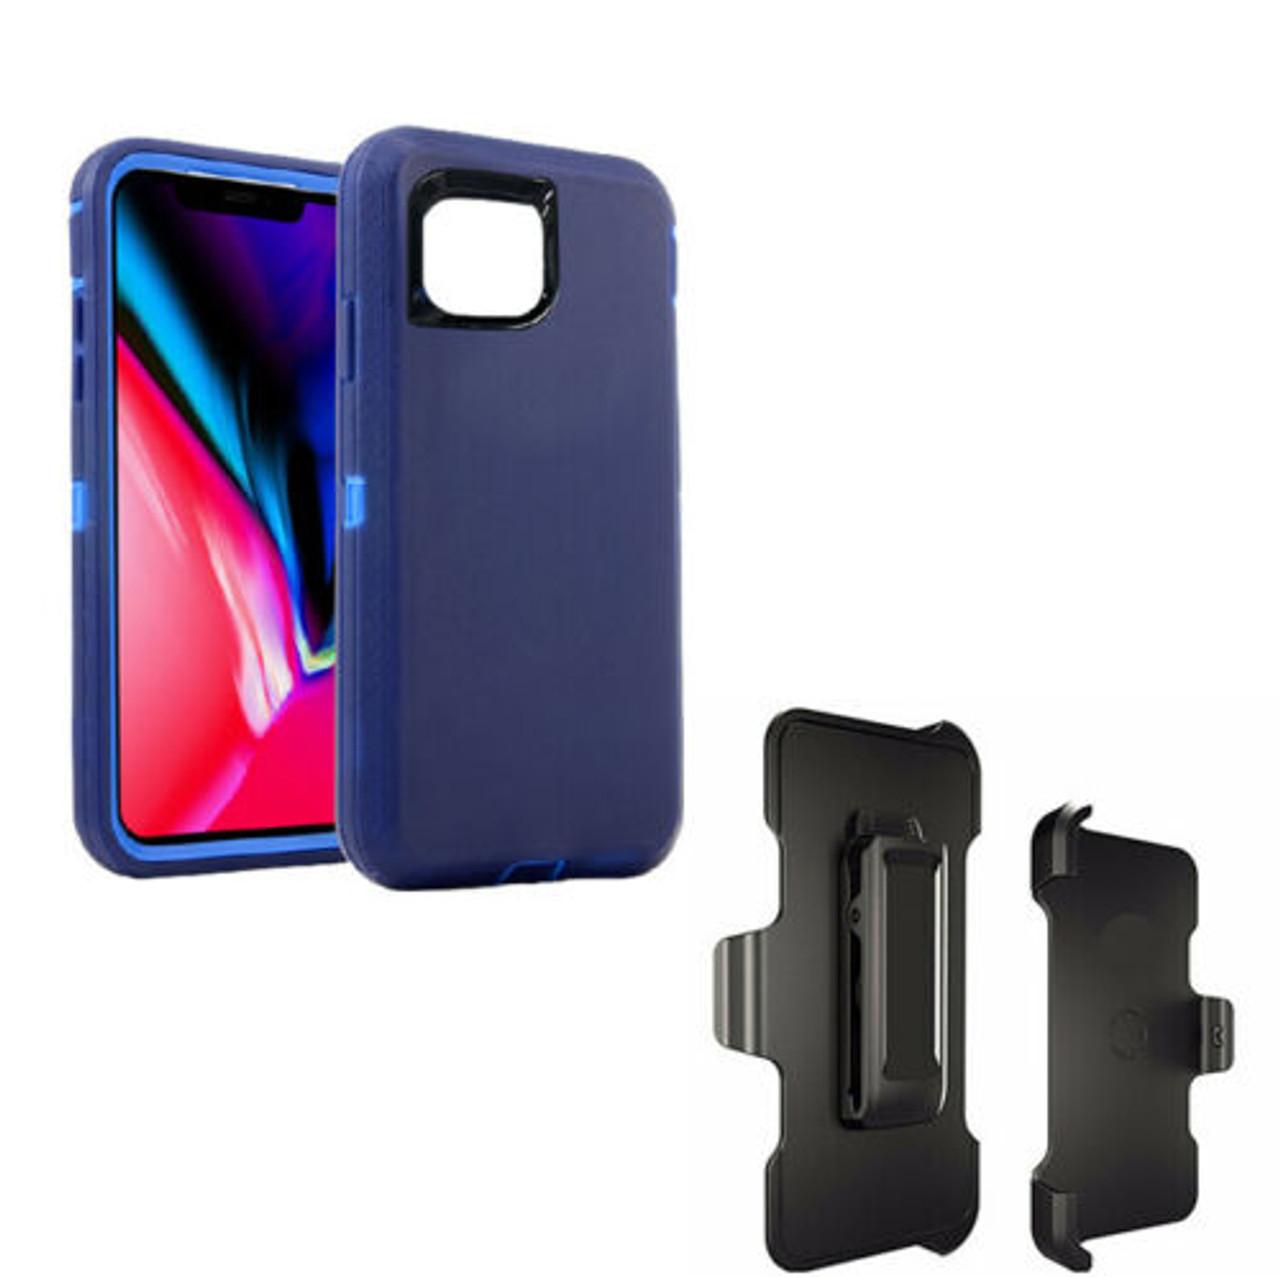 For iPhone 12 Mini 12 Pro Max Shockproof Defender Case Stand & Belt Clip Holster